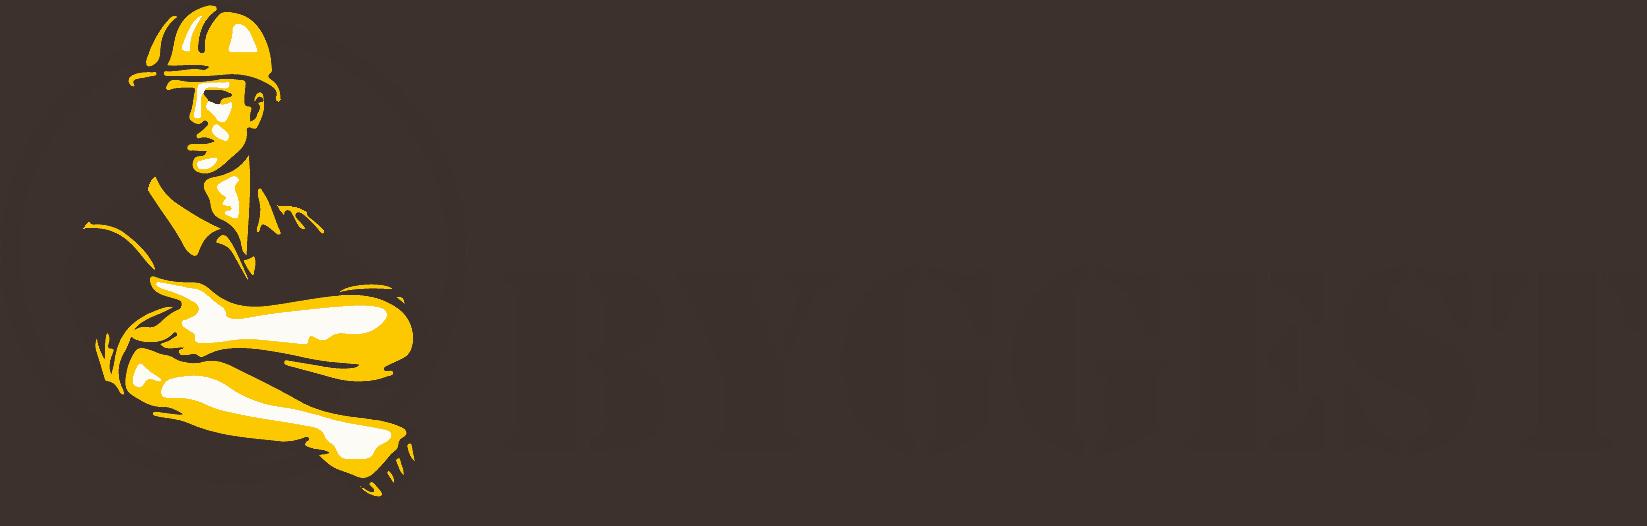 Logotyp för BYGGEST AB